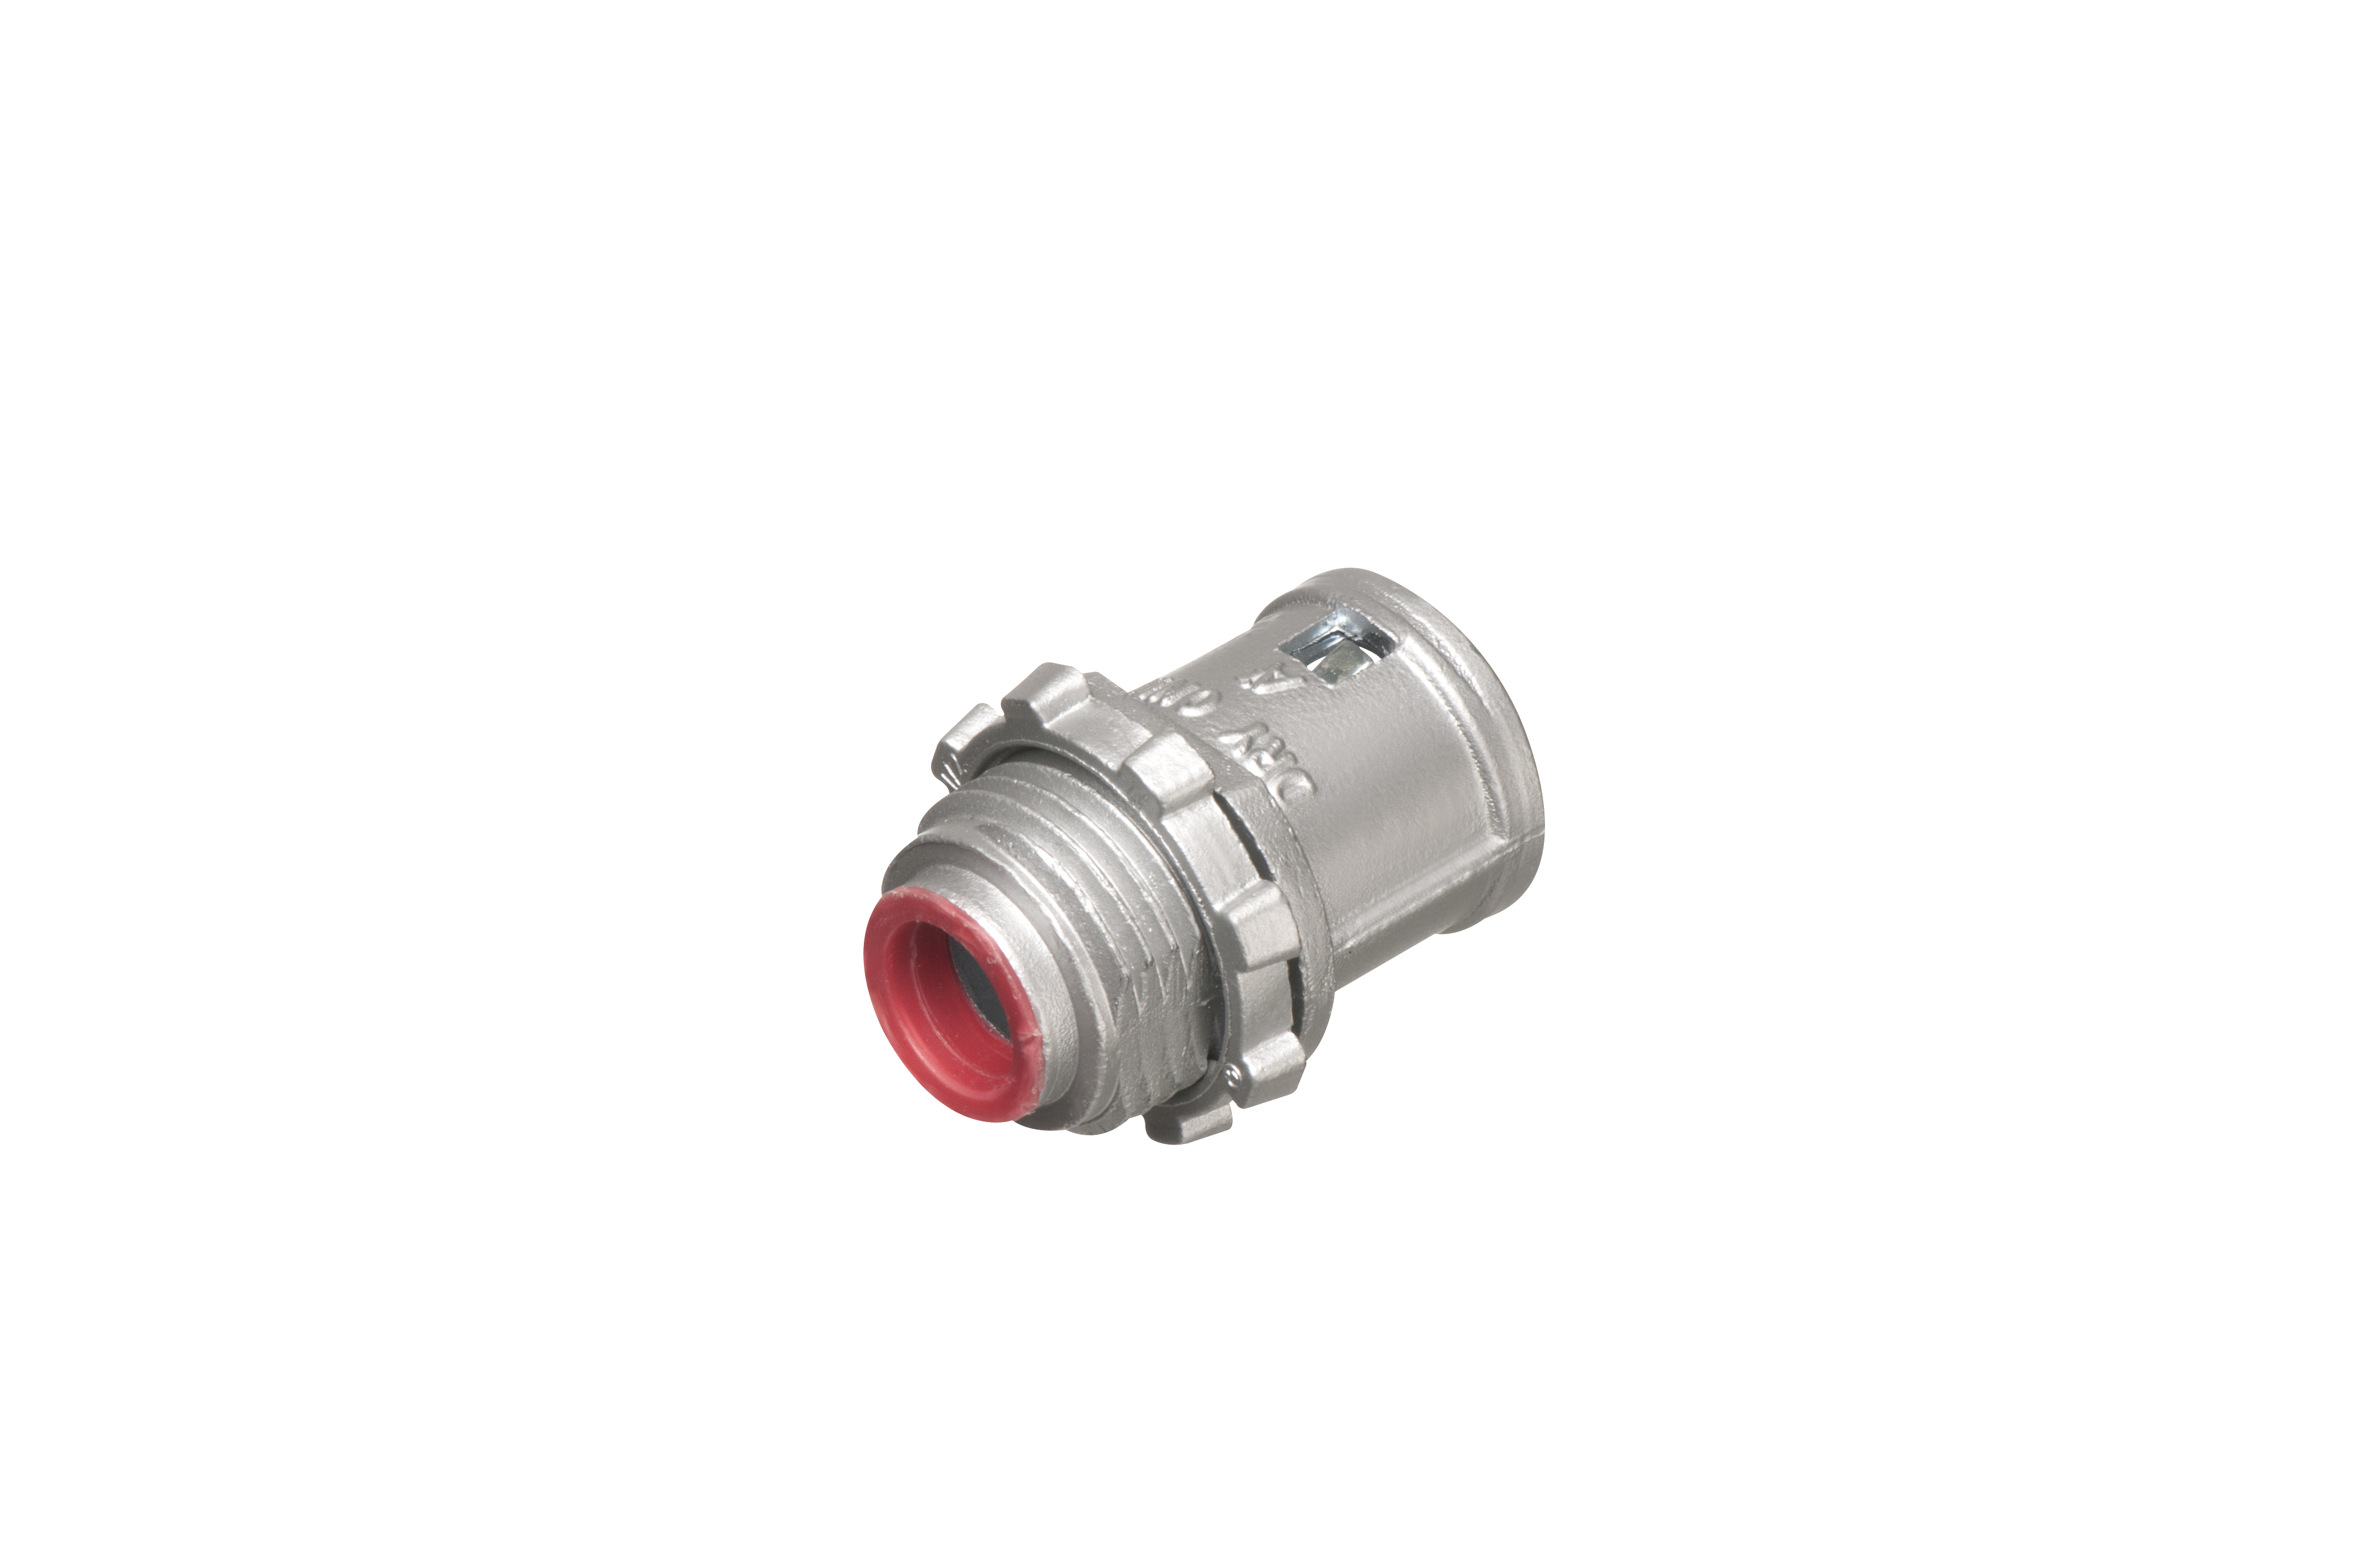 ARL 38A 0.37IN DIE CAST ZINC CONNECTOR